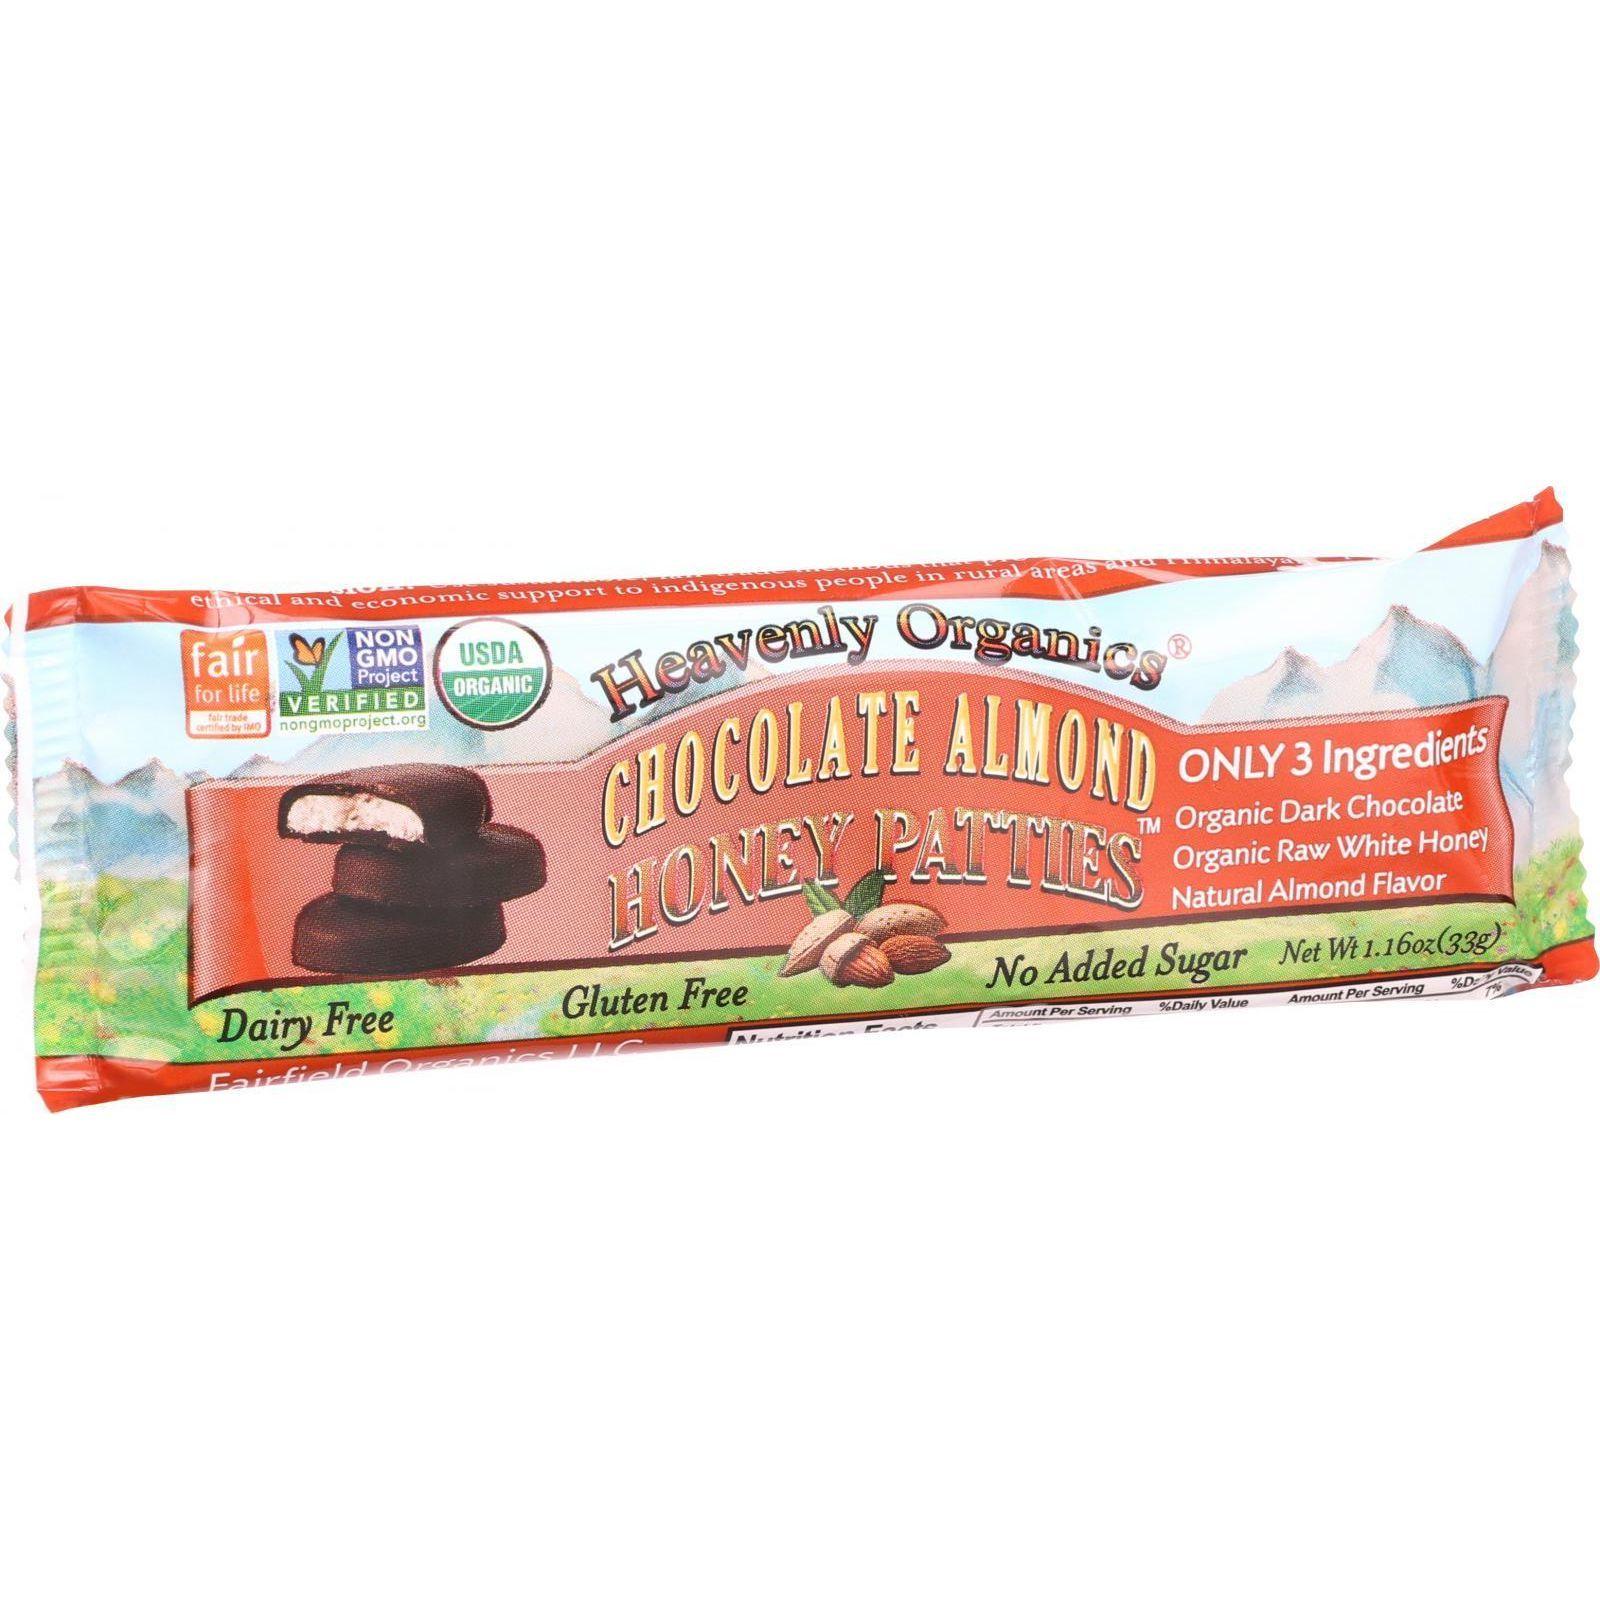 Heavenly Organics Honey Patties - Chocolate Almond - 1.2 oz - Case of 16